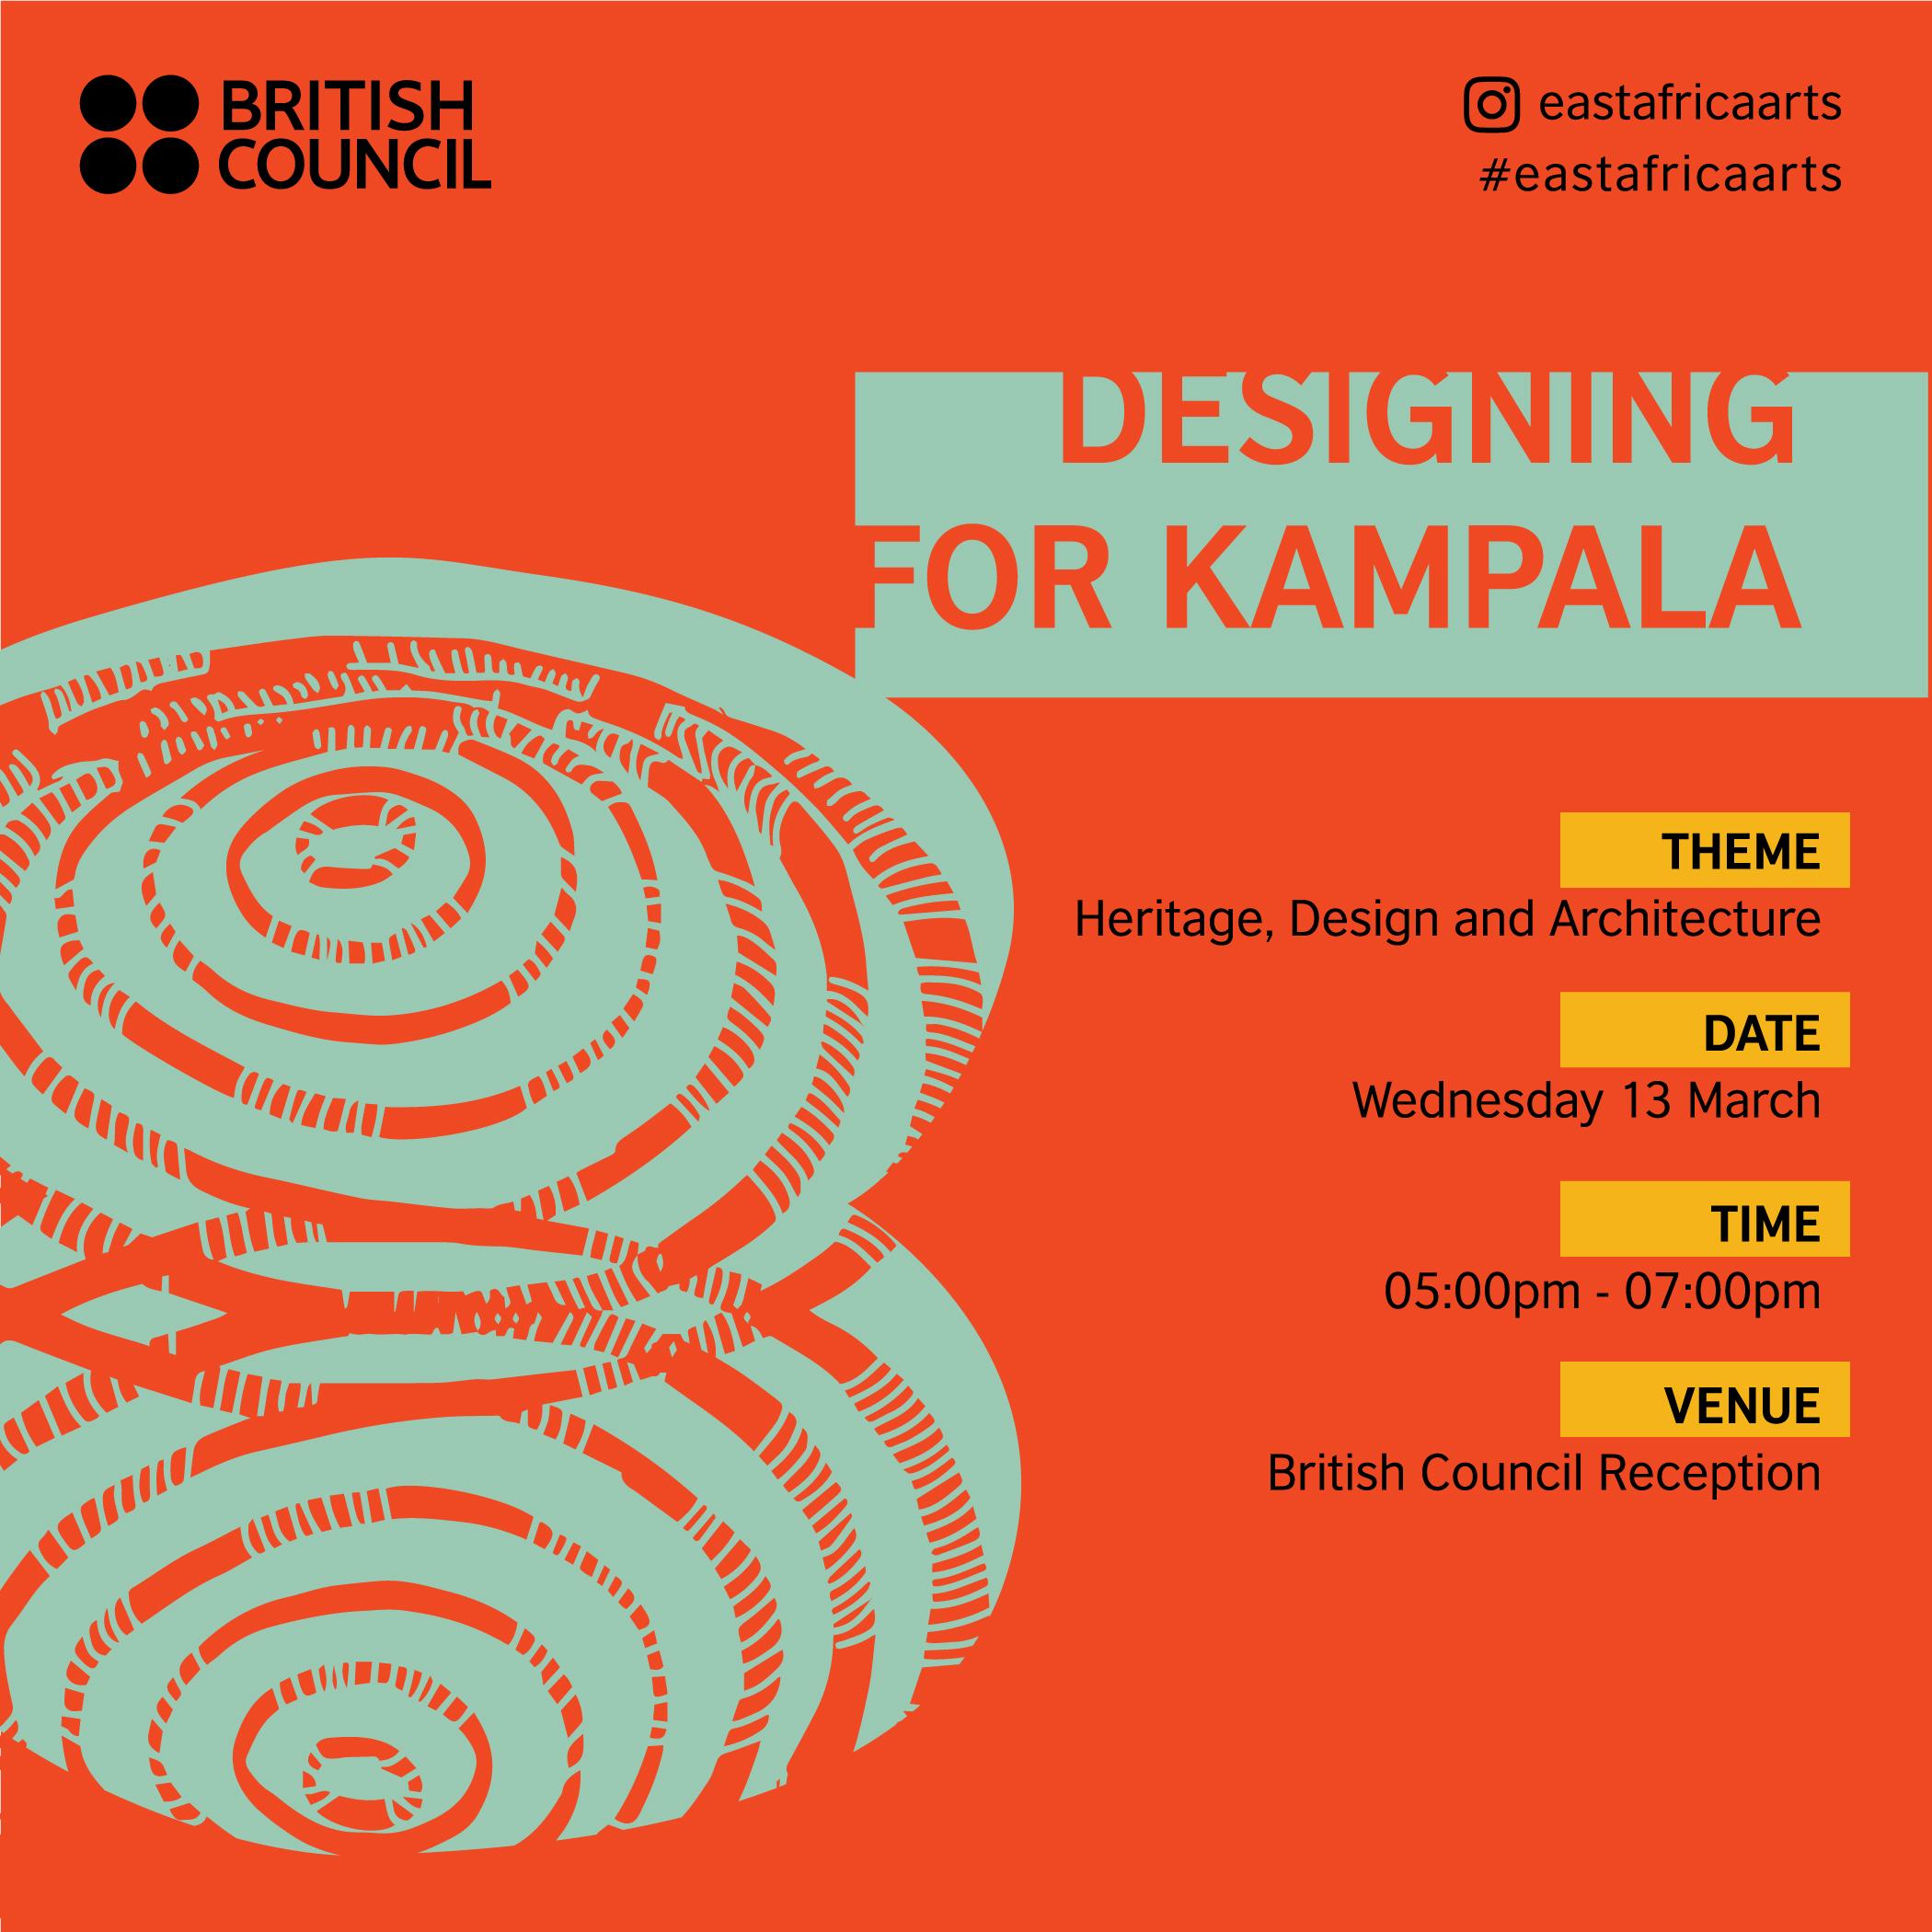 Designing-for-Kampala_INSTAGRAM.JPG